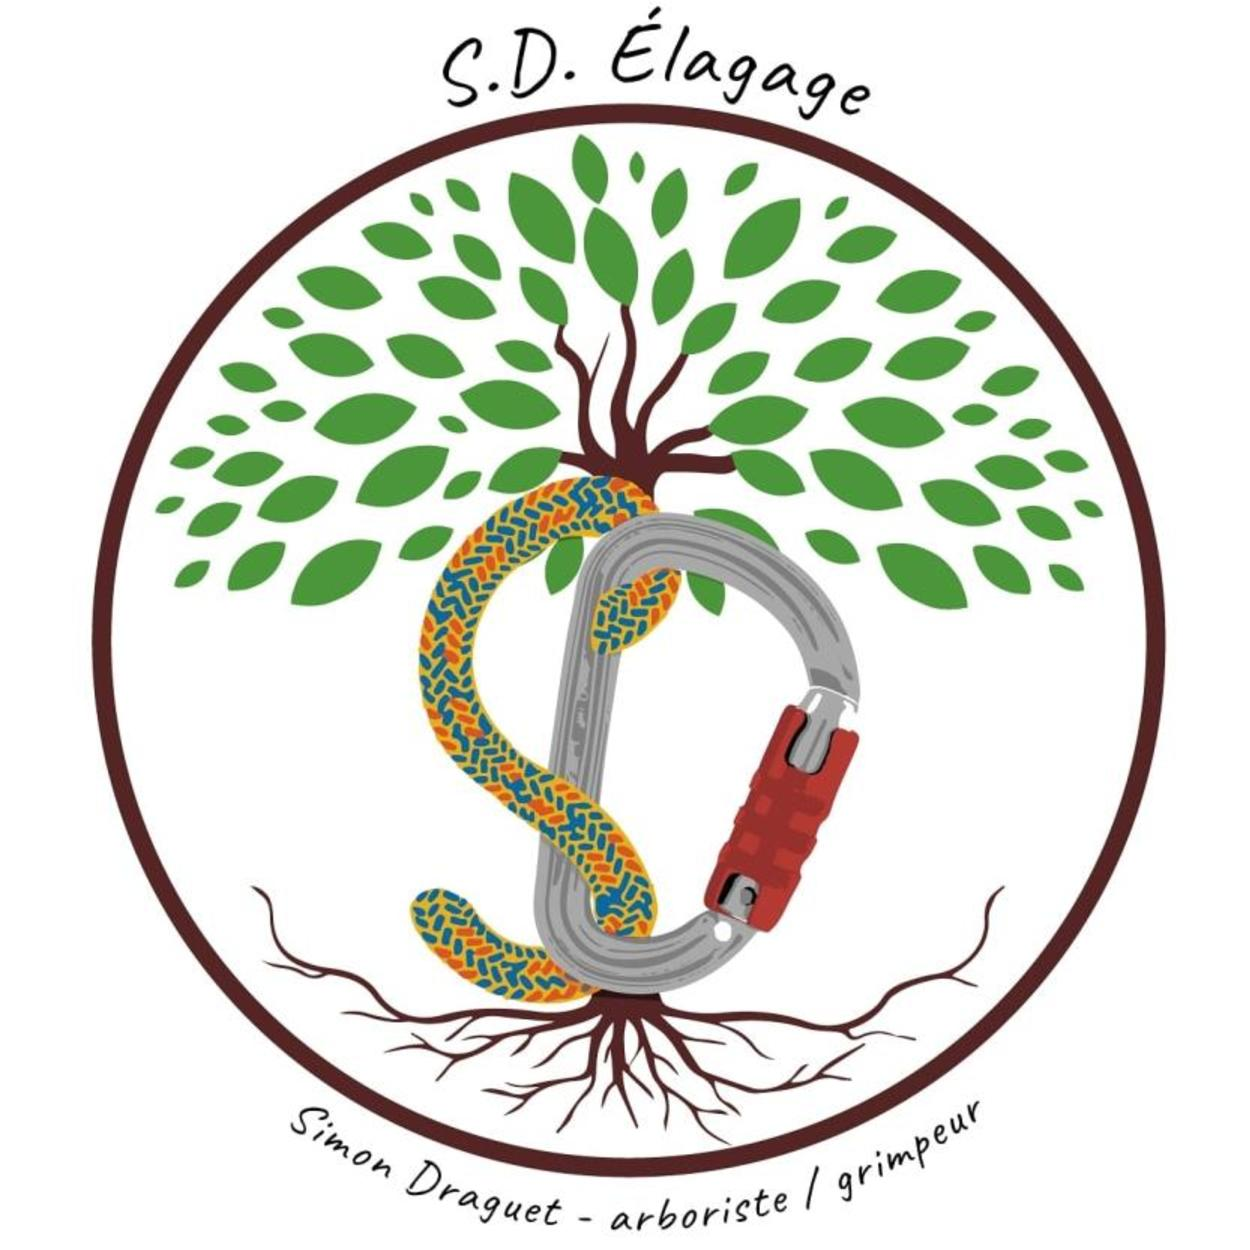 S.D. Elagage